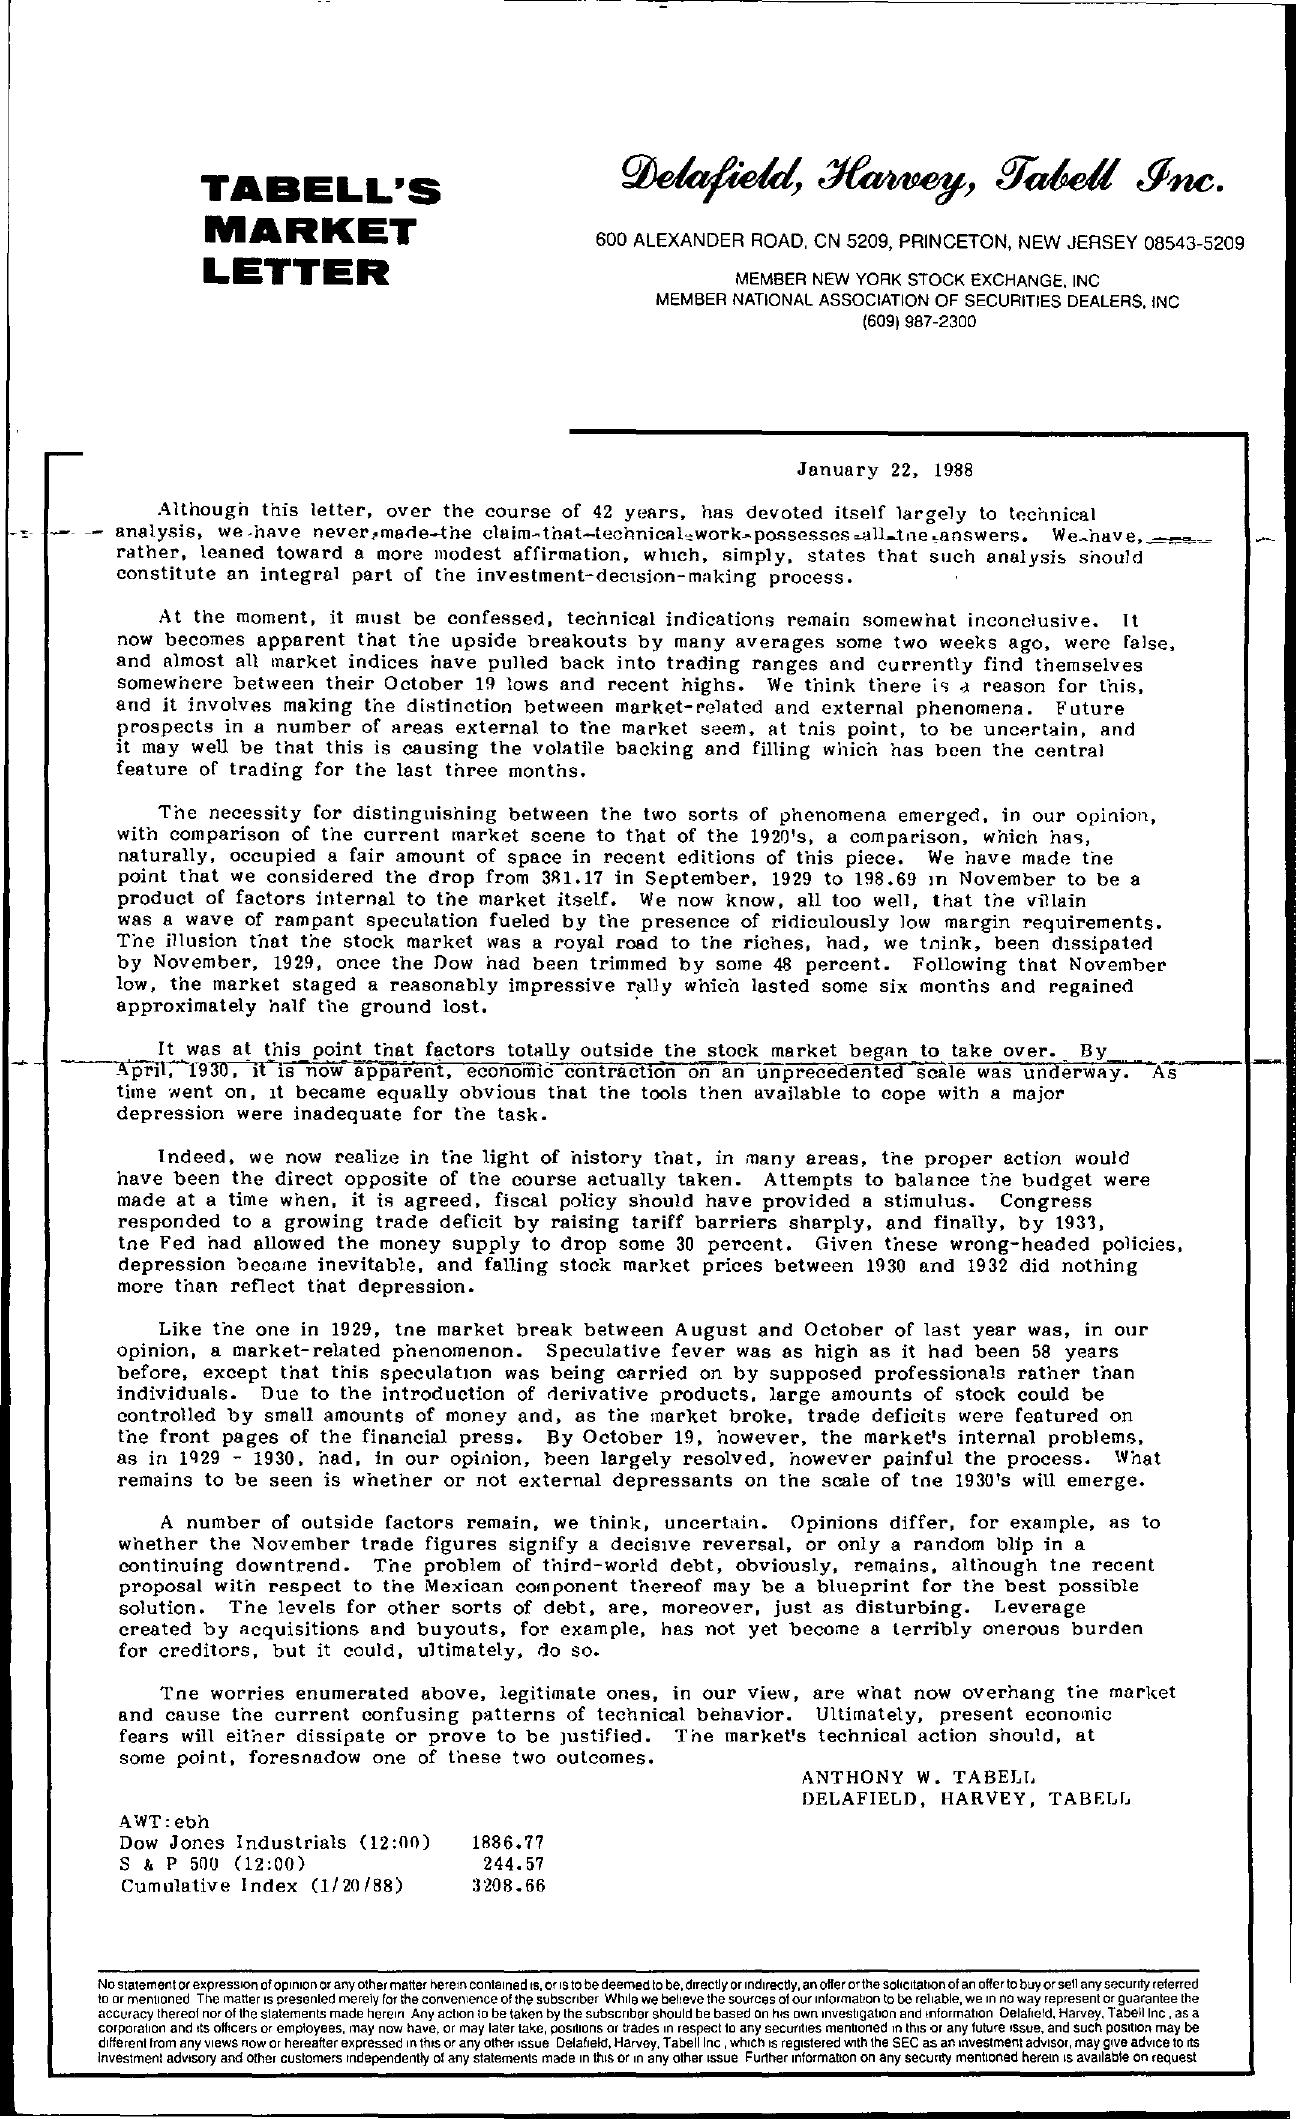 Tabell's Market Letter - January 22, 1988